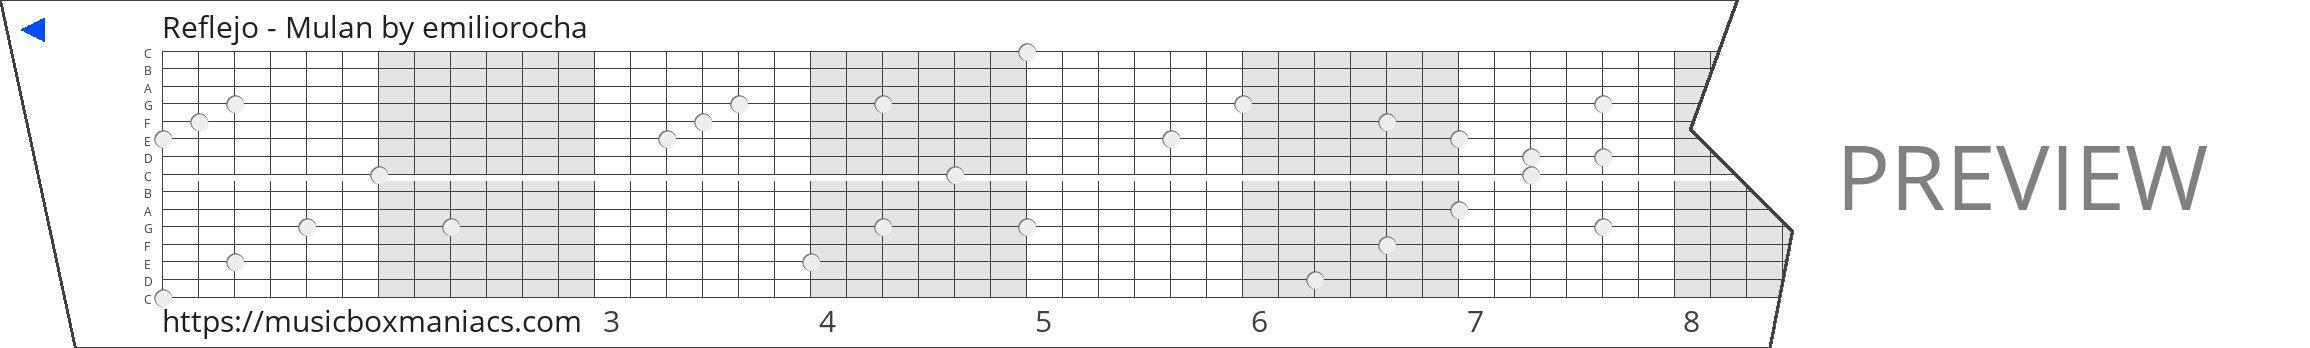 Reflejo - Mulan 15 note music box paper strip